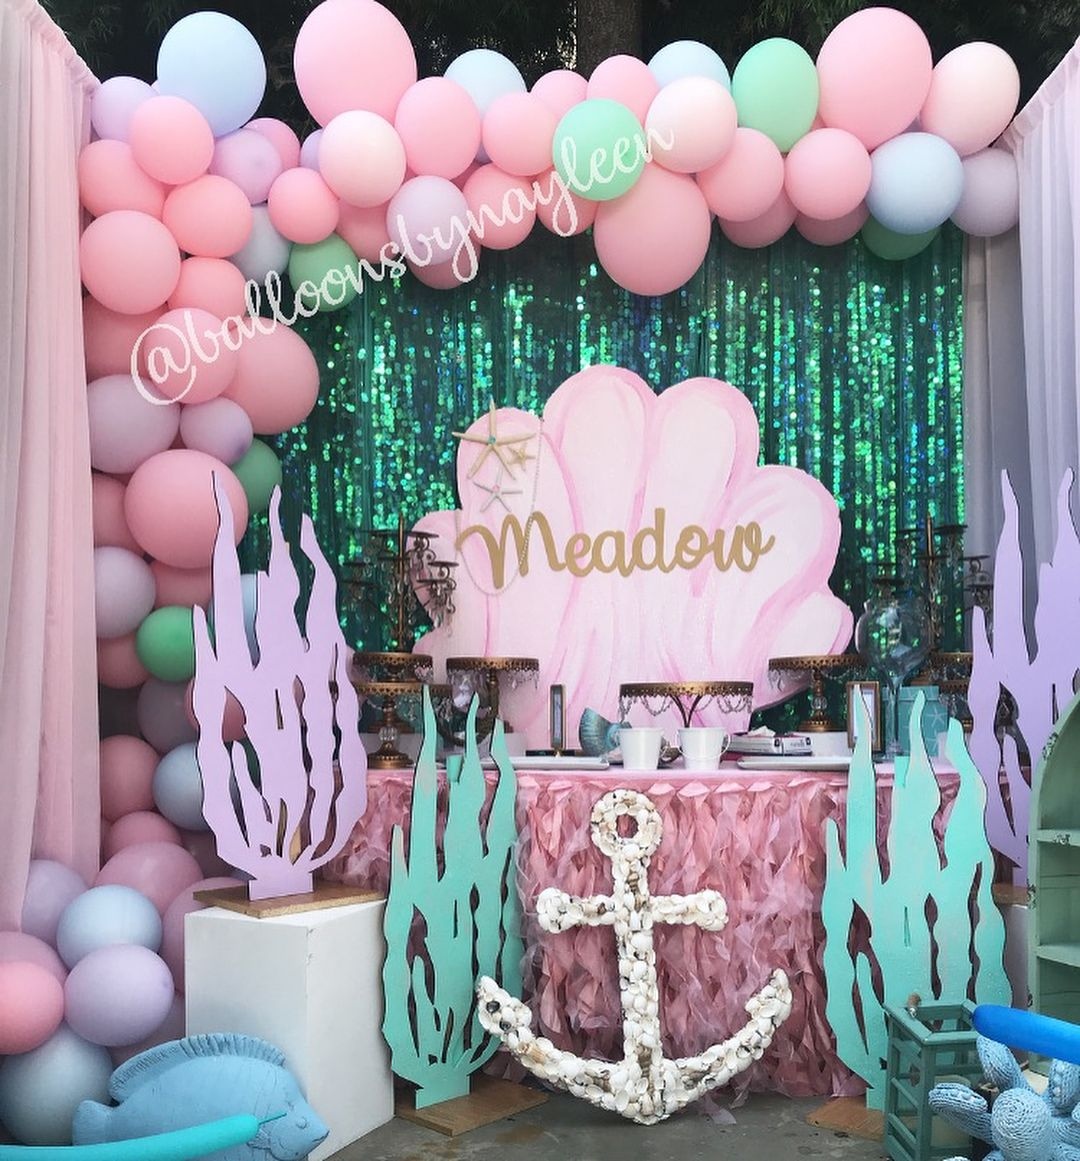 Mermaid Party Setup Mermaid Birthday Party Decorations Mermaid Theme Birthday Party Mermaid Birthday Party